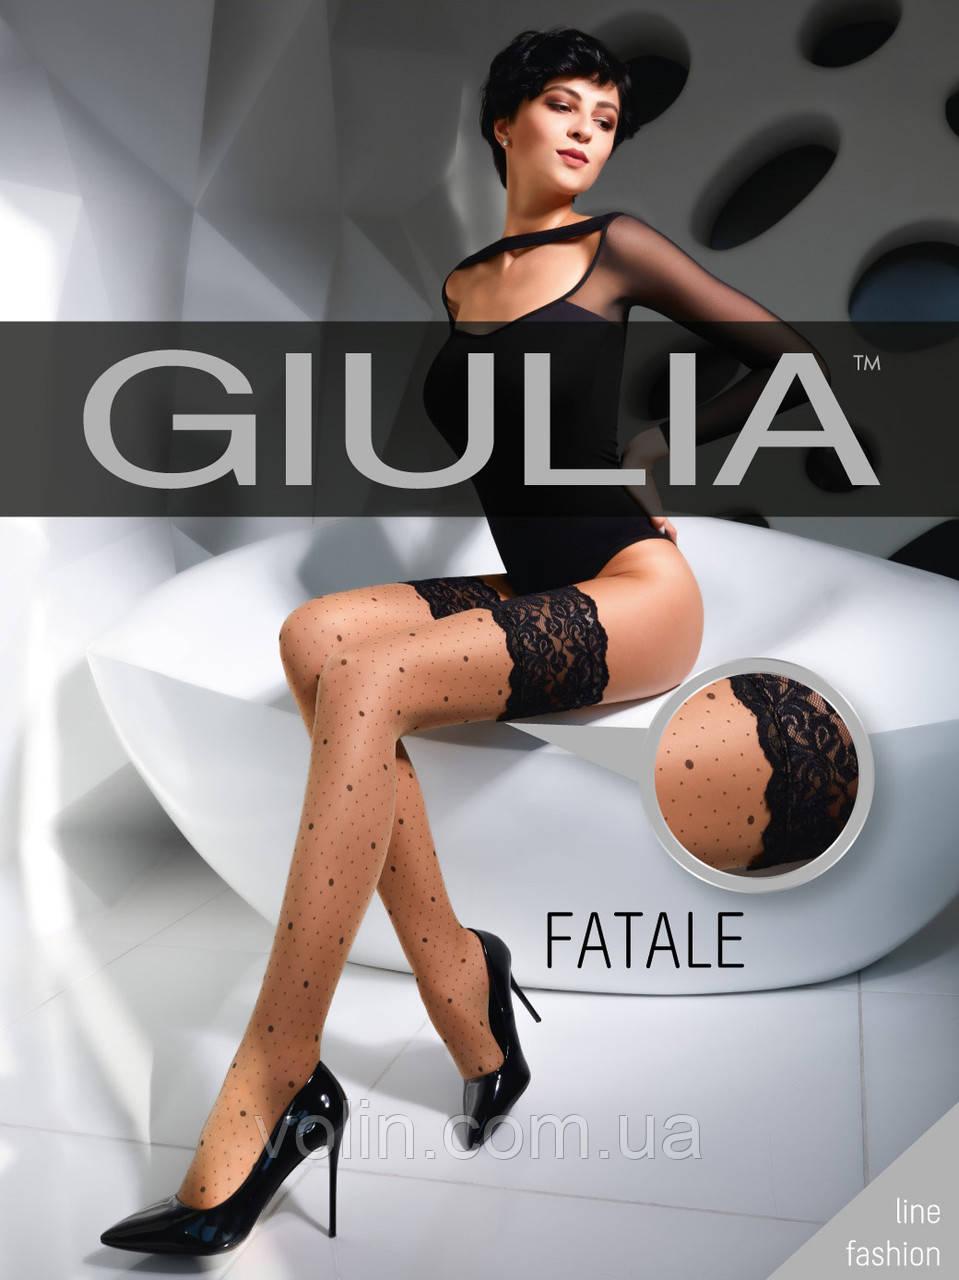 Чулки Giulia Fatale 20 model 2